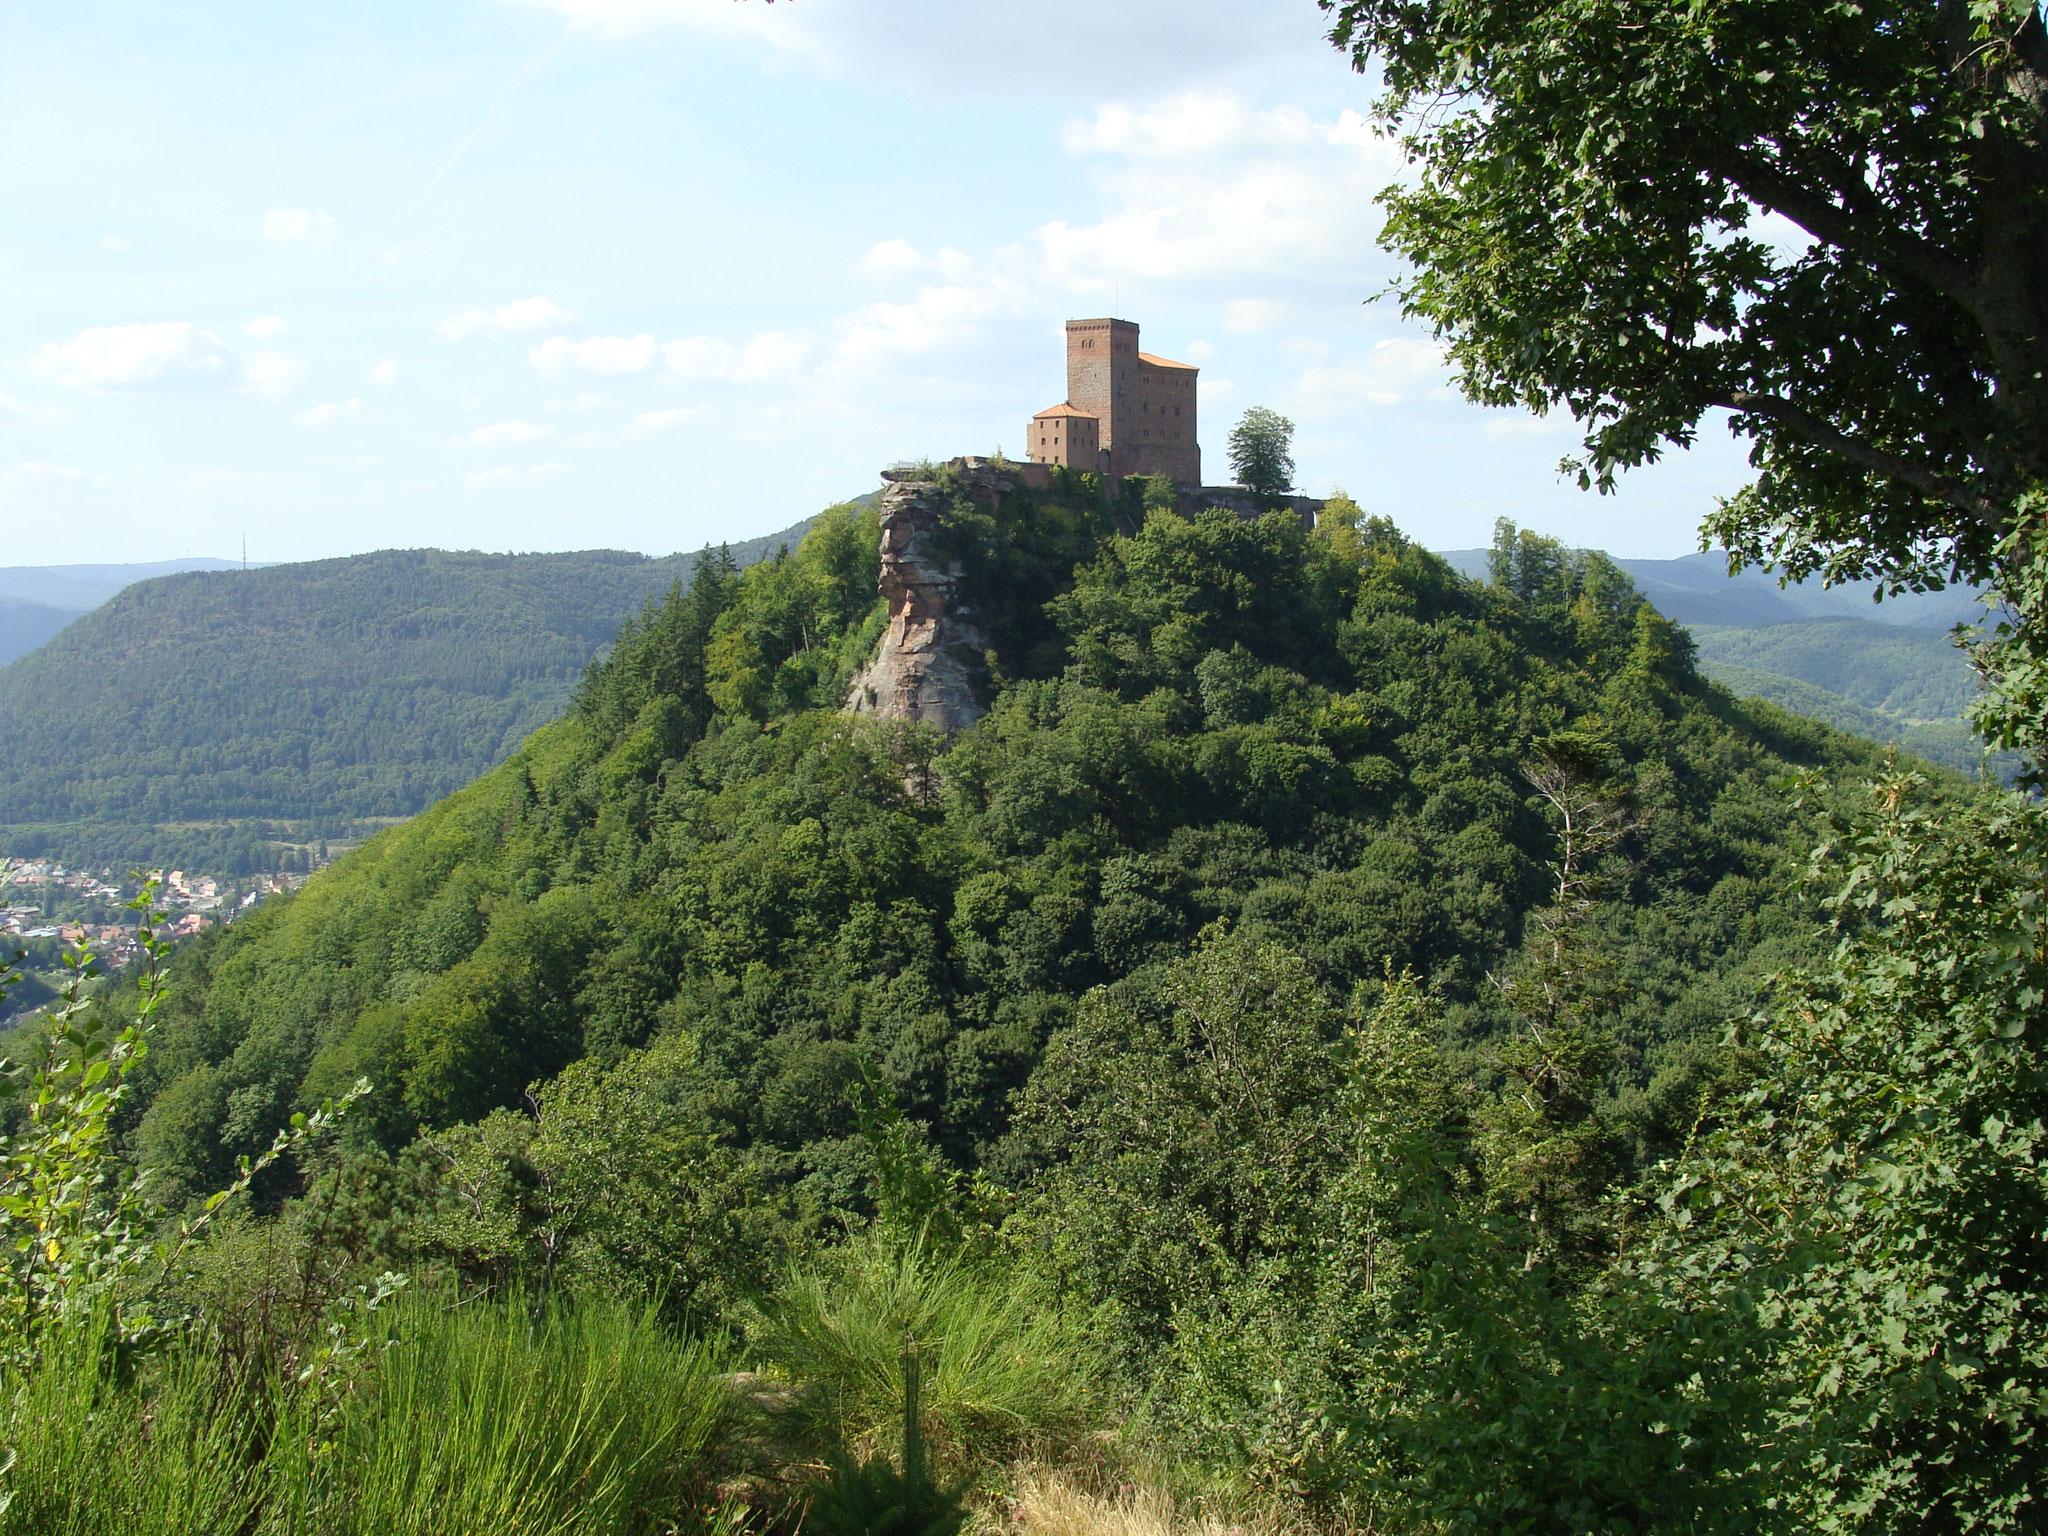 Wanderziel: Reichsburg Trifels